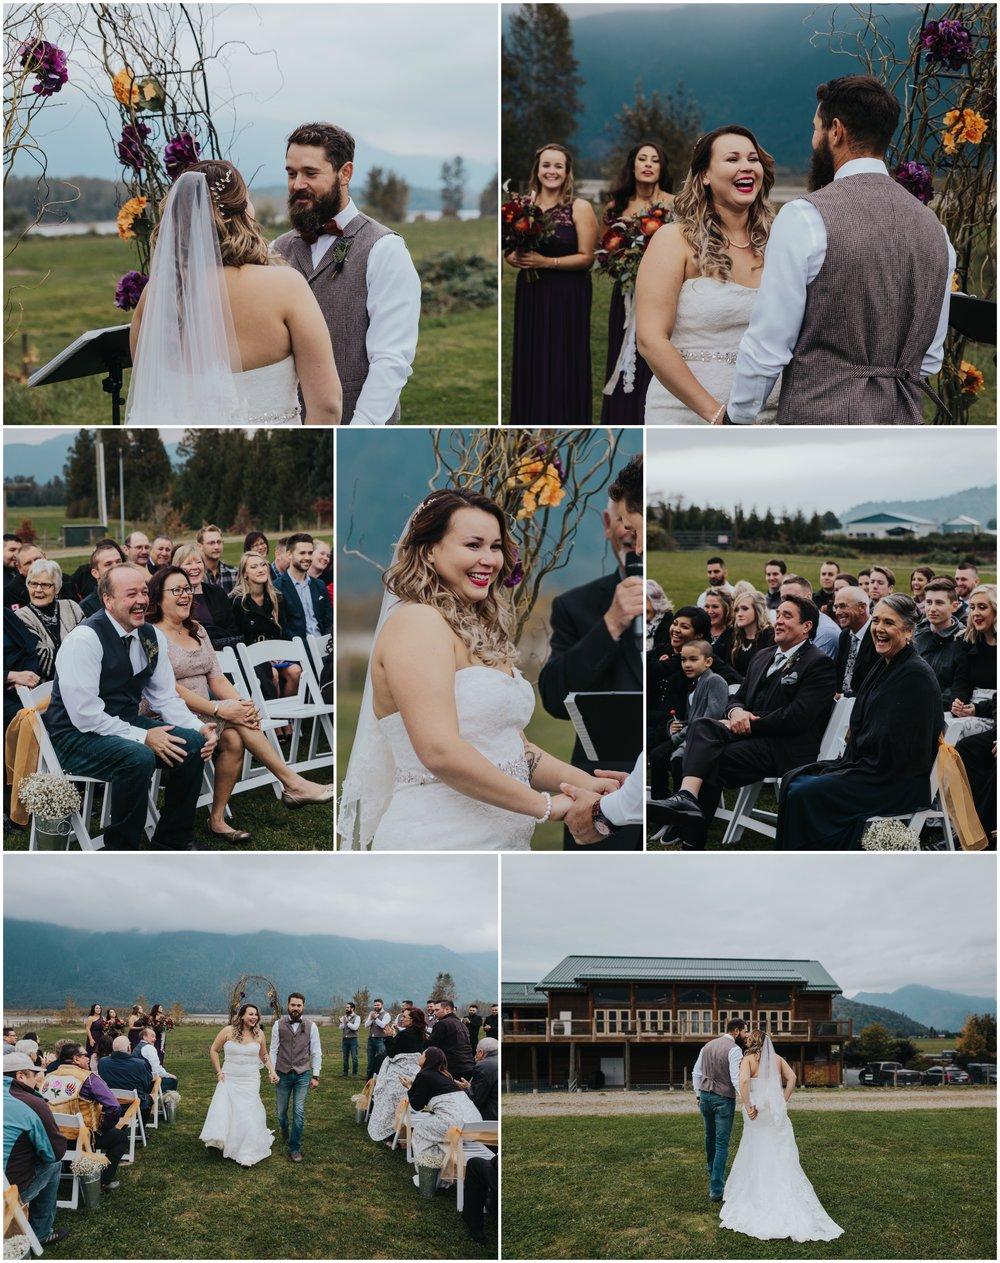 Fraser River Lodge, Rustic Pine Wedding, Red, Purple, Plaid 9.jpg